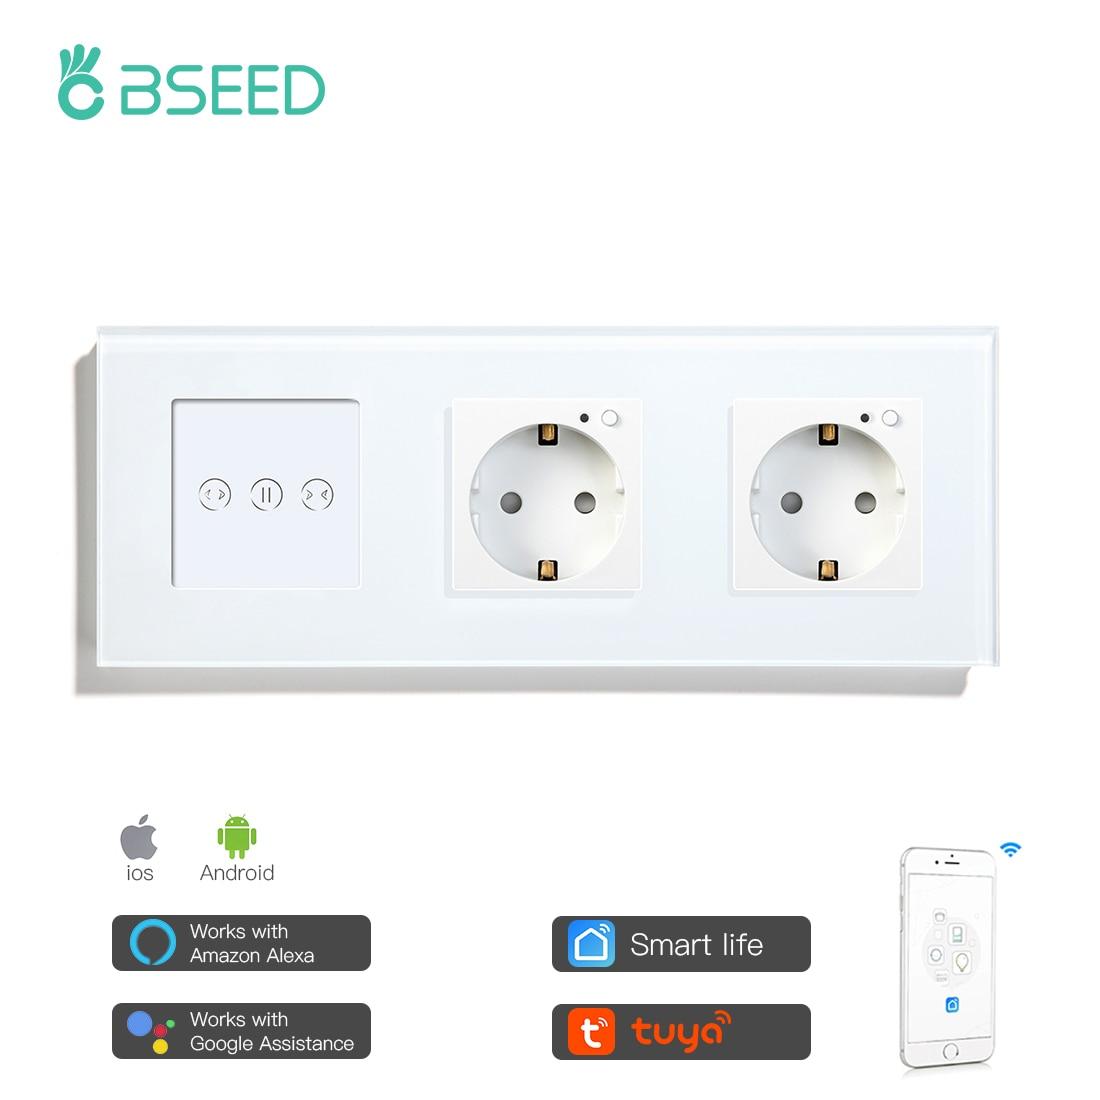 Bseed-ستارة ذكية مع تحكم صوتي ومقبس أوروبي مزدوج ، للستائر الذكية ، من أجل Tuya ، الحياة الذكية ، تحسين المنزل